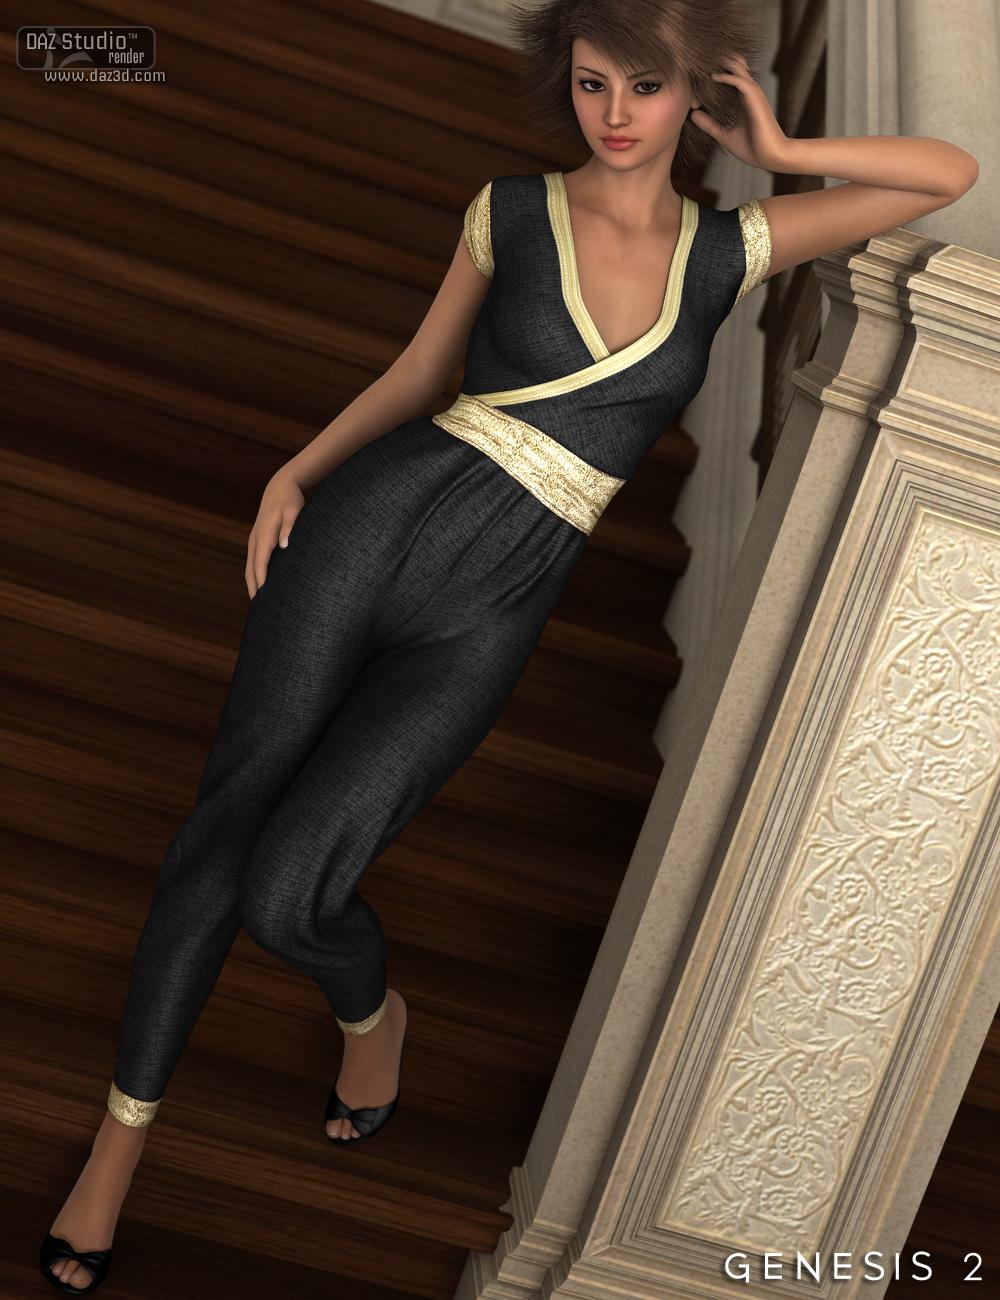 Ashleigh Jumpsuit for Genesis 2 Female(s) by: Nikisatez, 3D Models by Daz 3D